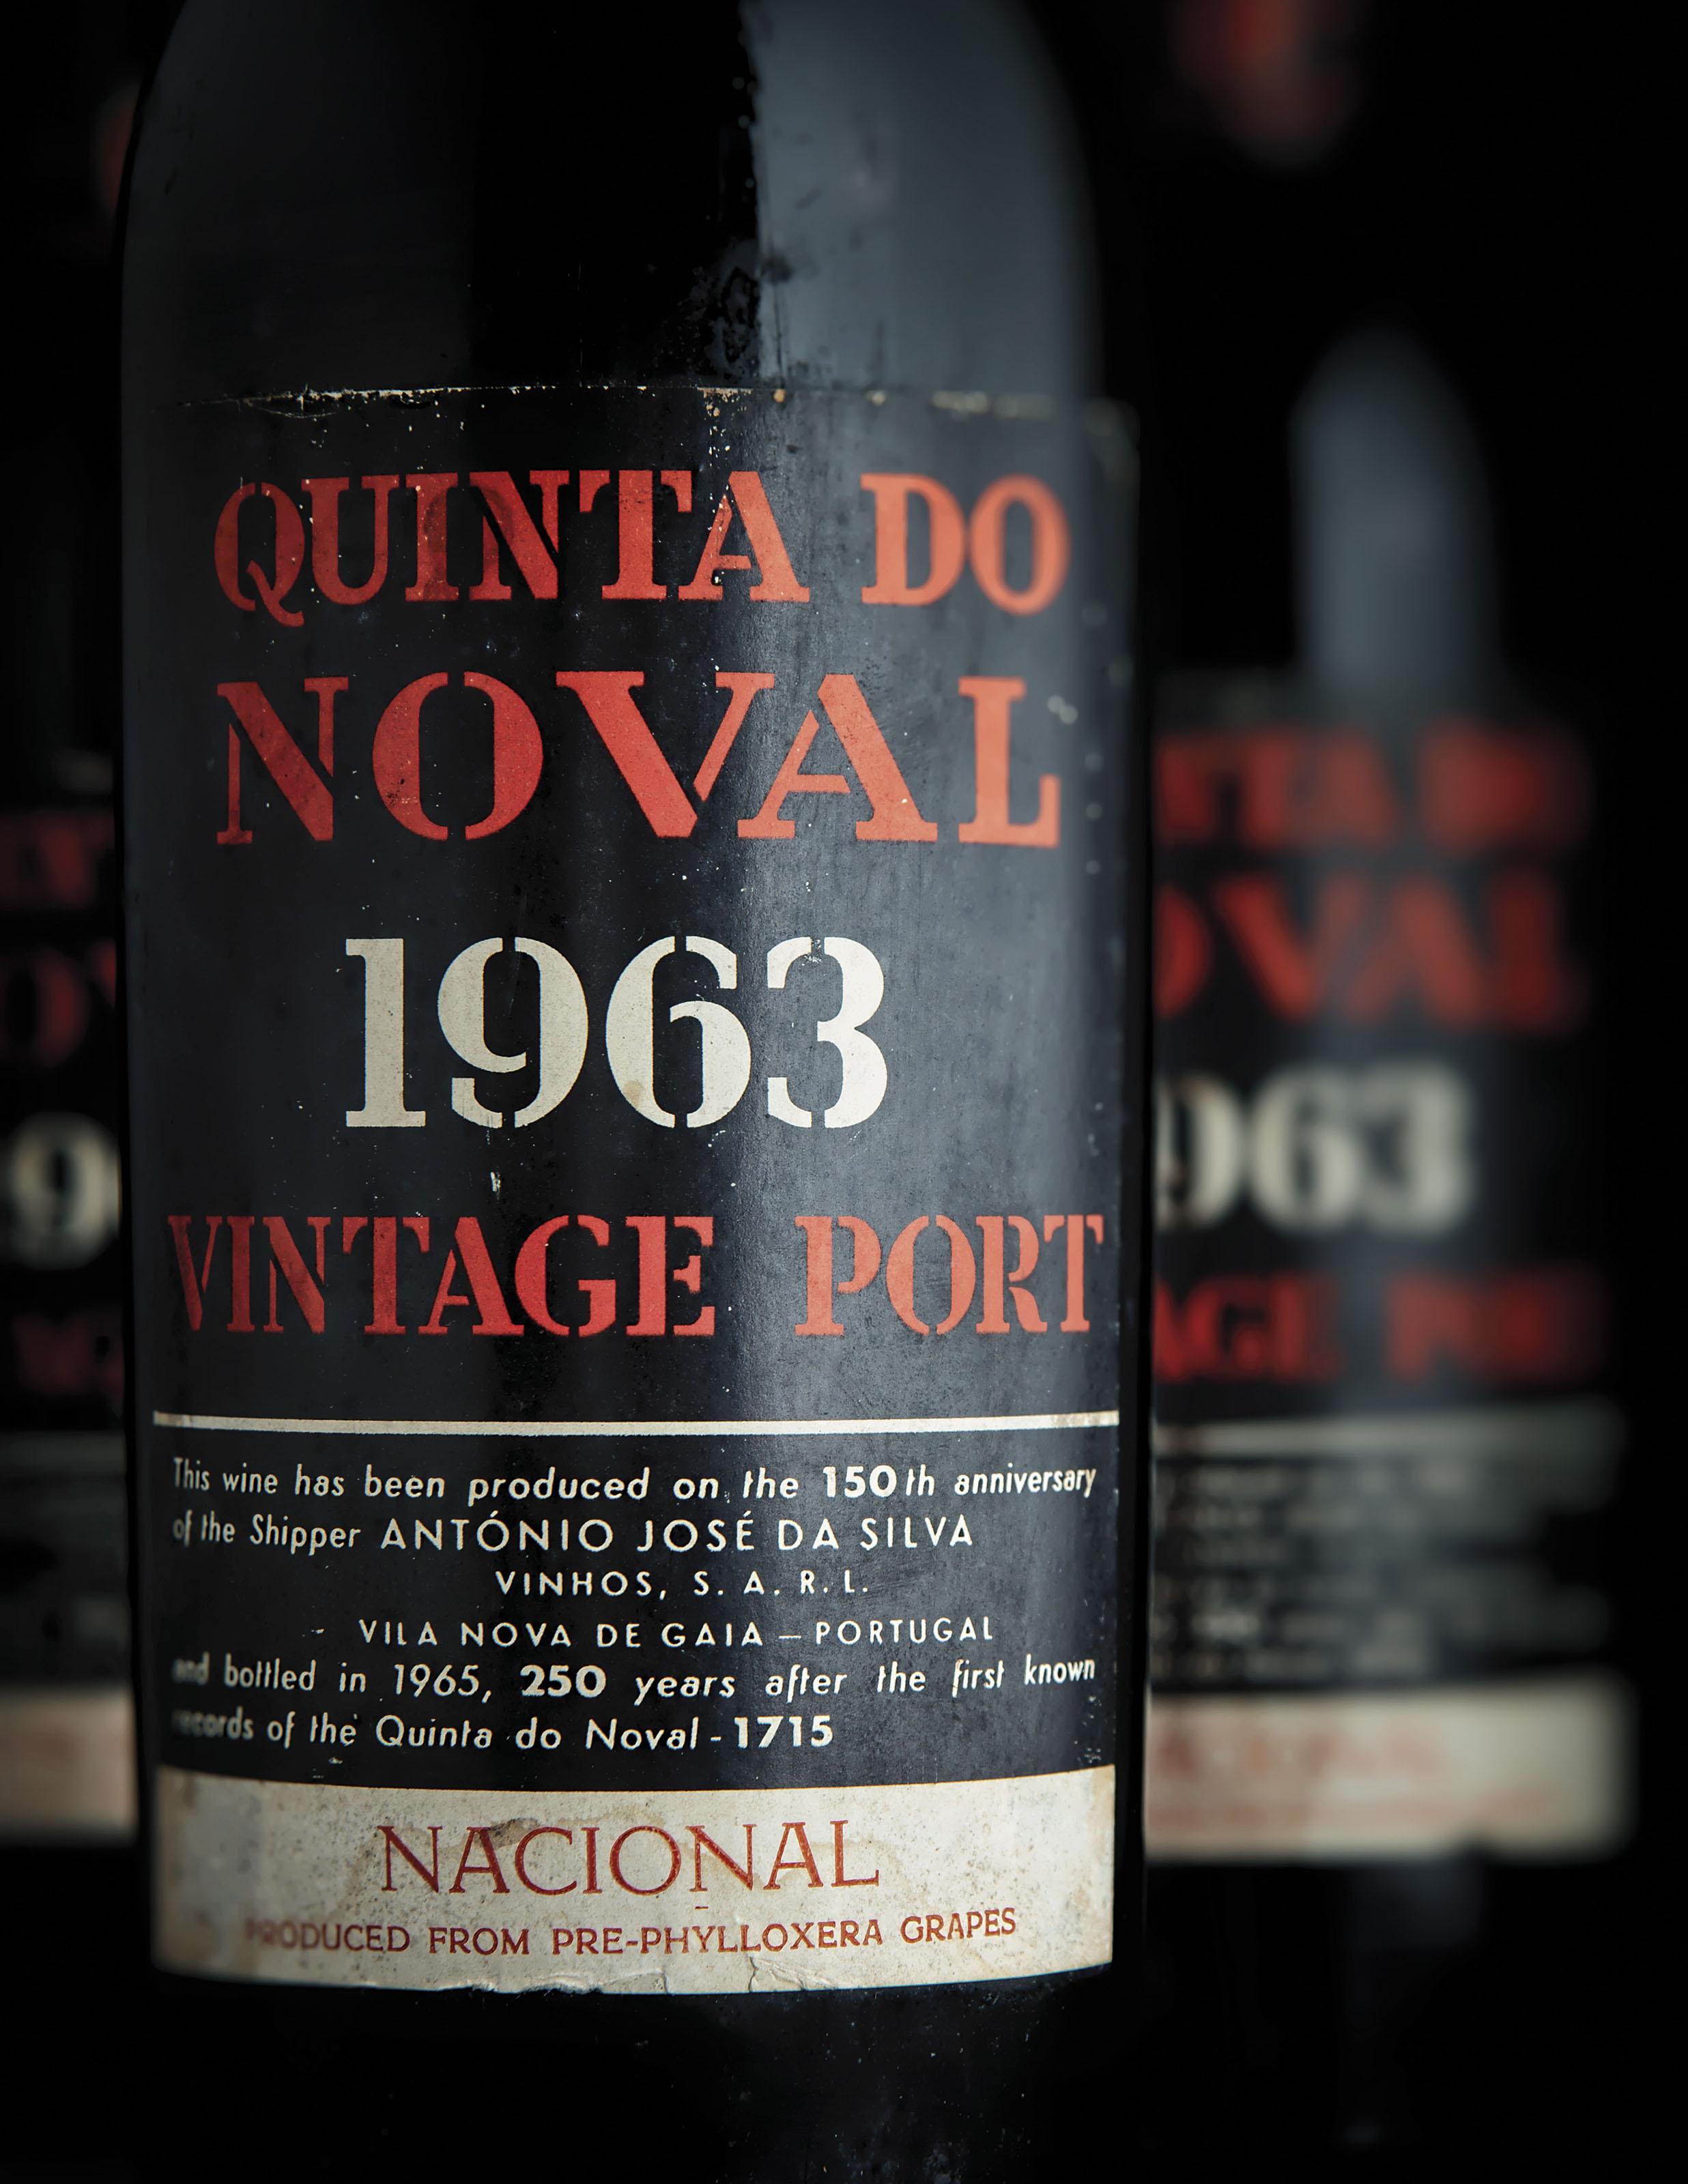 Quinta do Noval Nacional 1963